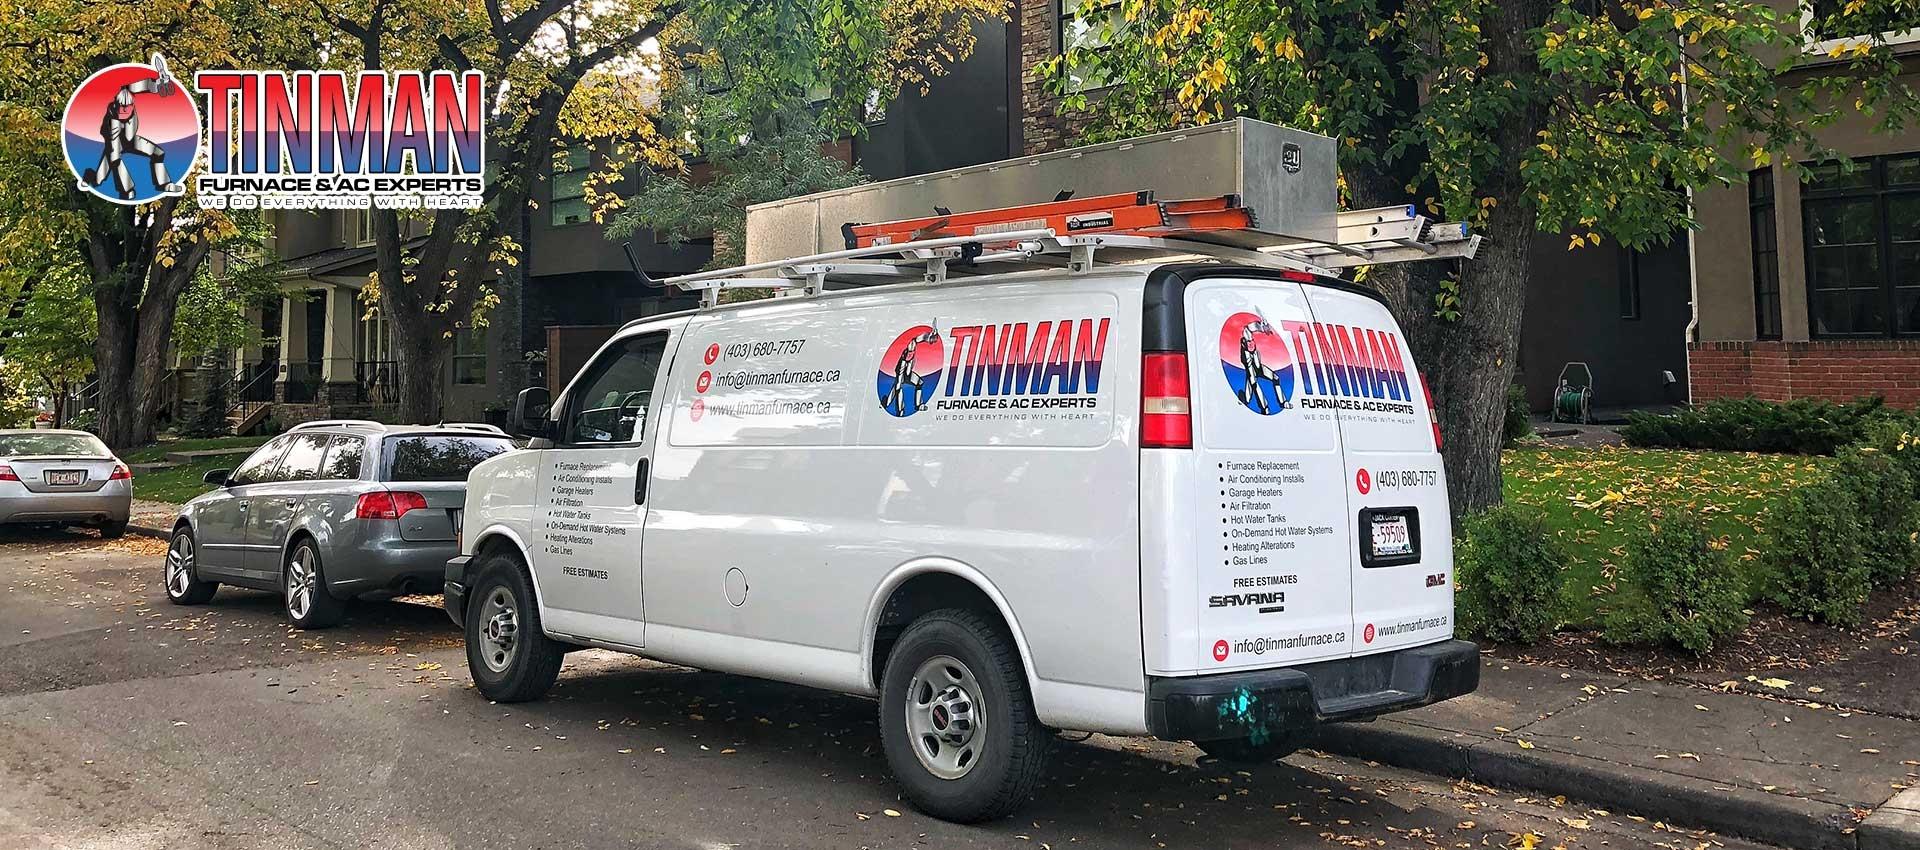 Tinman Furnace & AC Experts (@tinmanfurnace) Cover Image